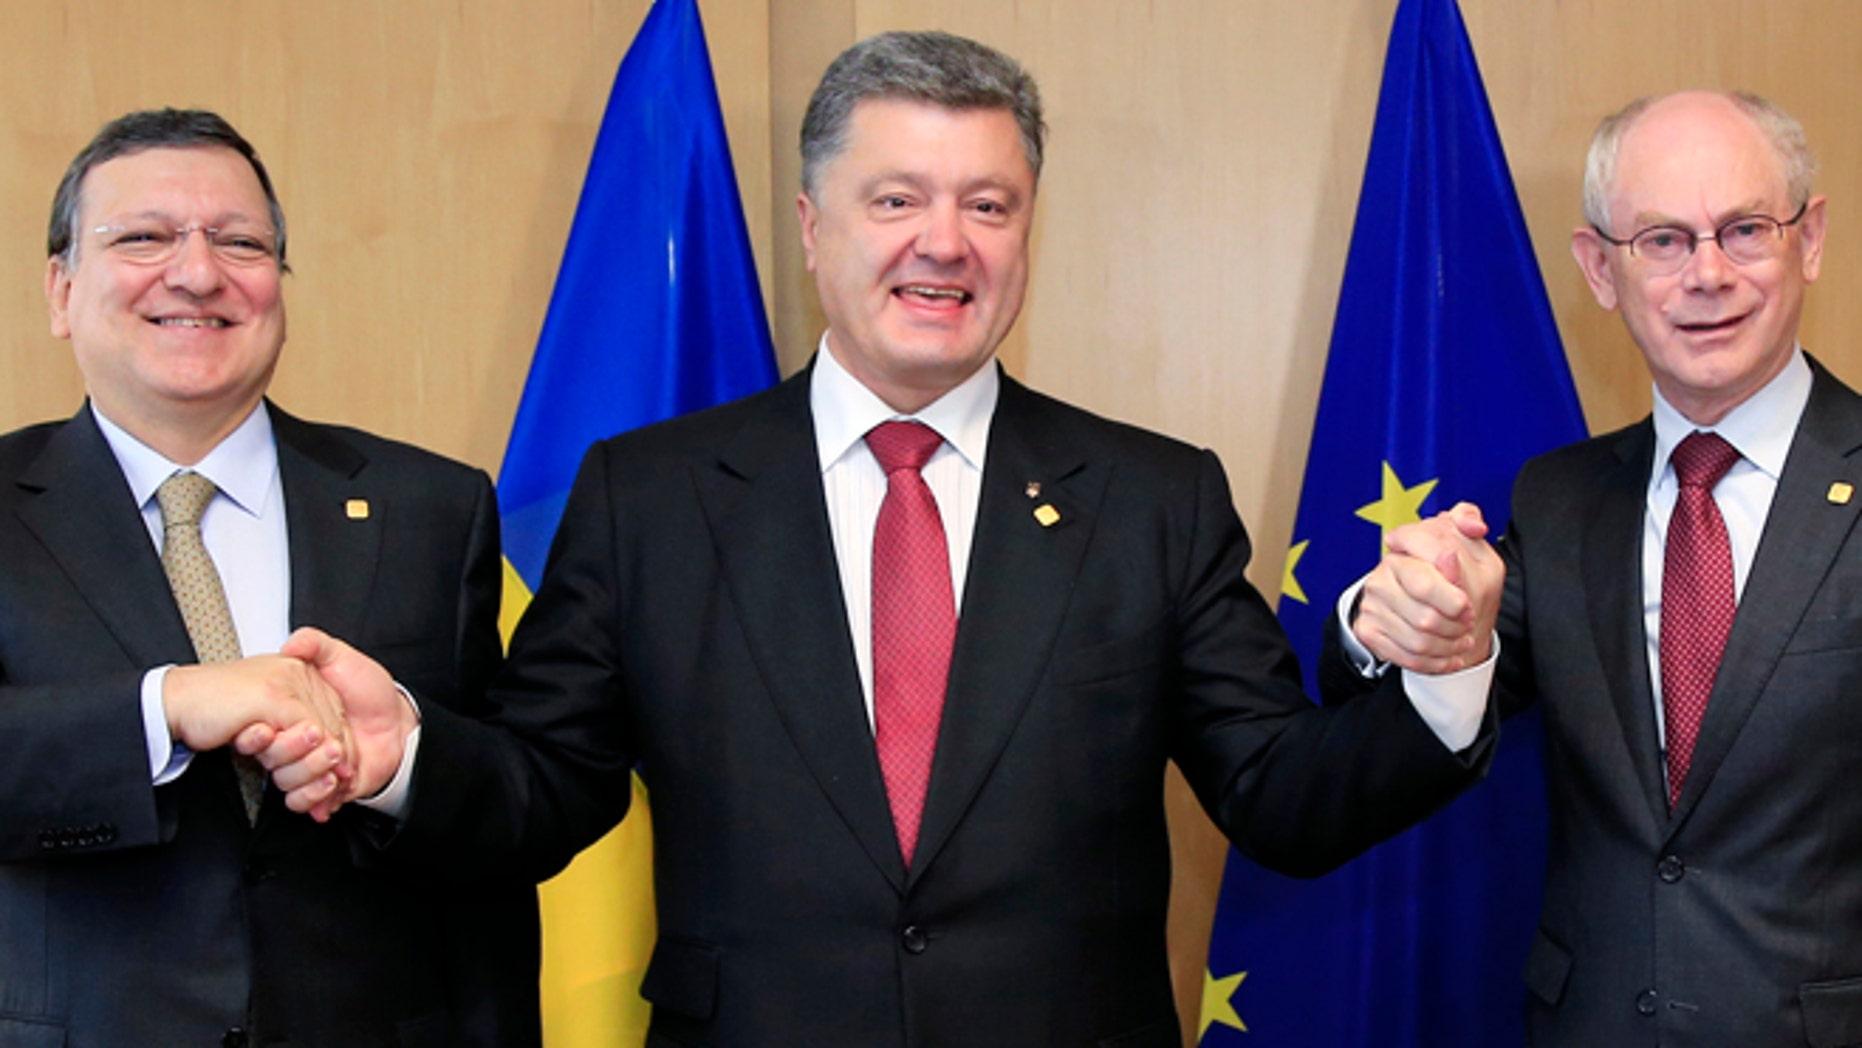 June 27, 2014: Ukraine's President Petro Poroshenko poses with European Commission President Jose Manuel Barroso (L) and European Council President Herman Van Rompuy (R) at the EU Council in Brussels.